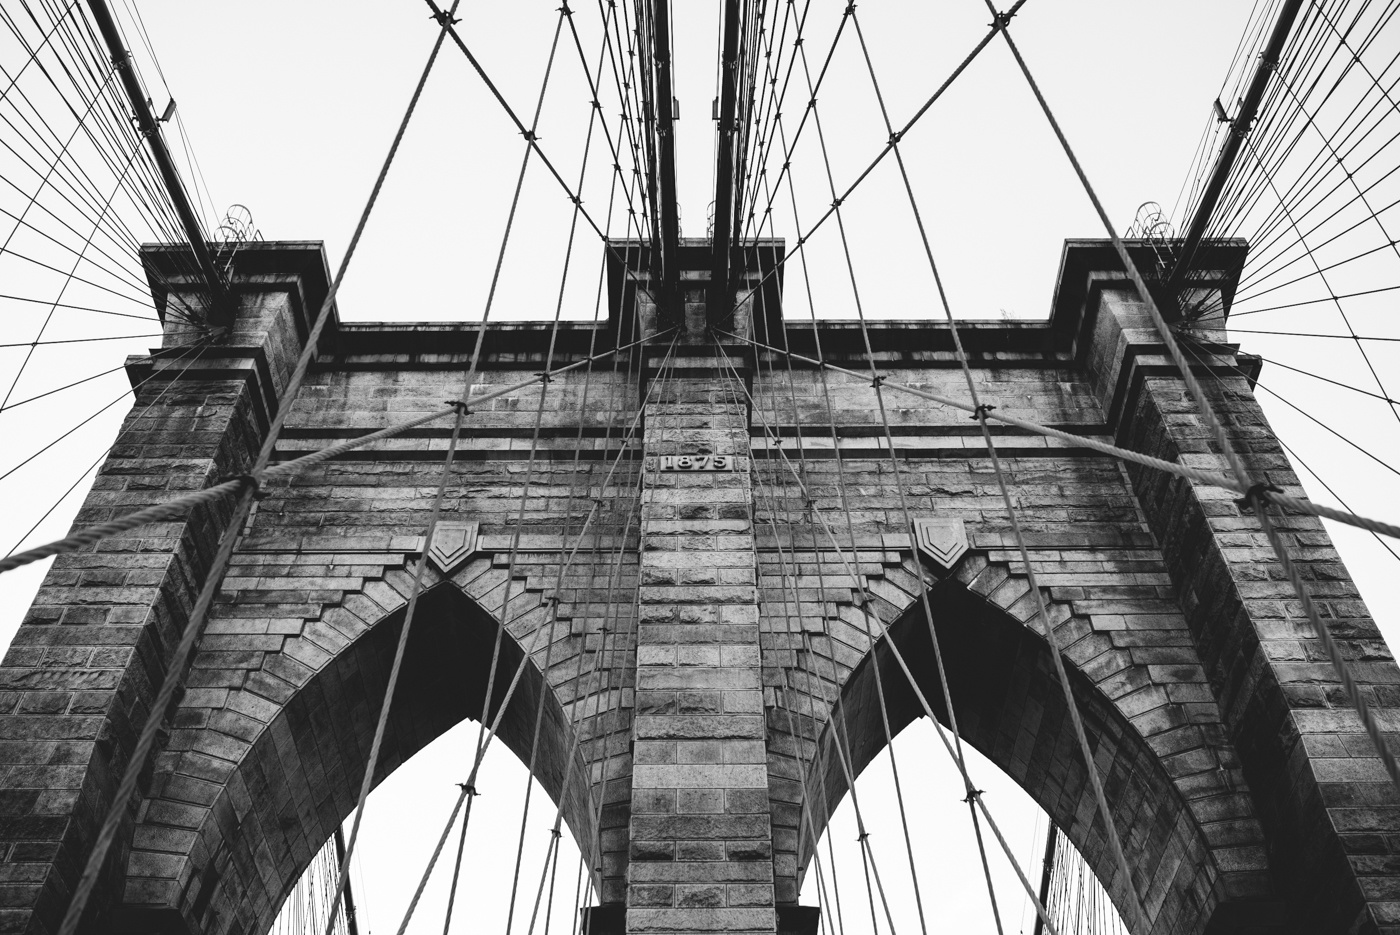 Classic view of the Brooklyn Bridge by Marco Fiorini